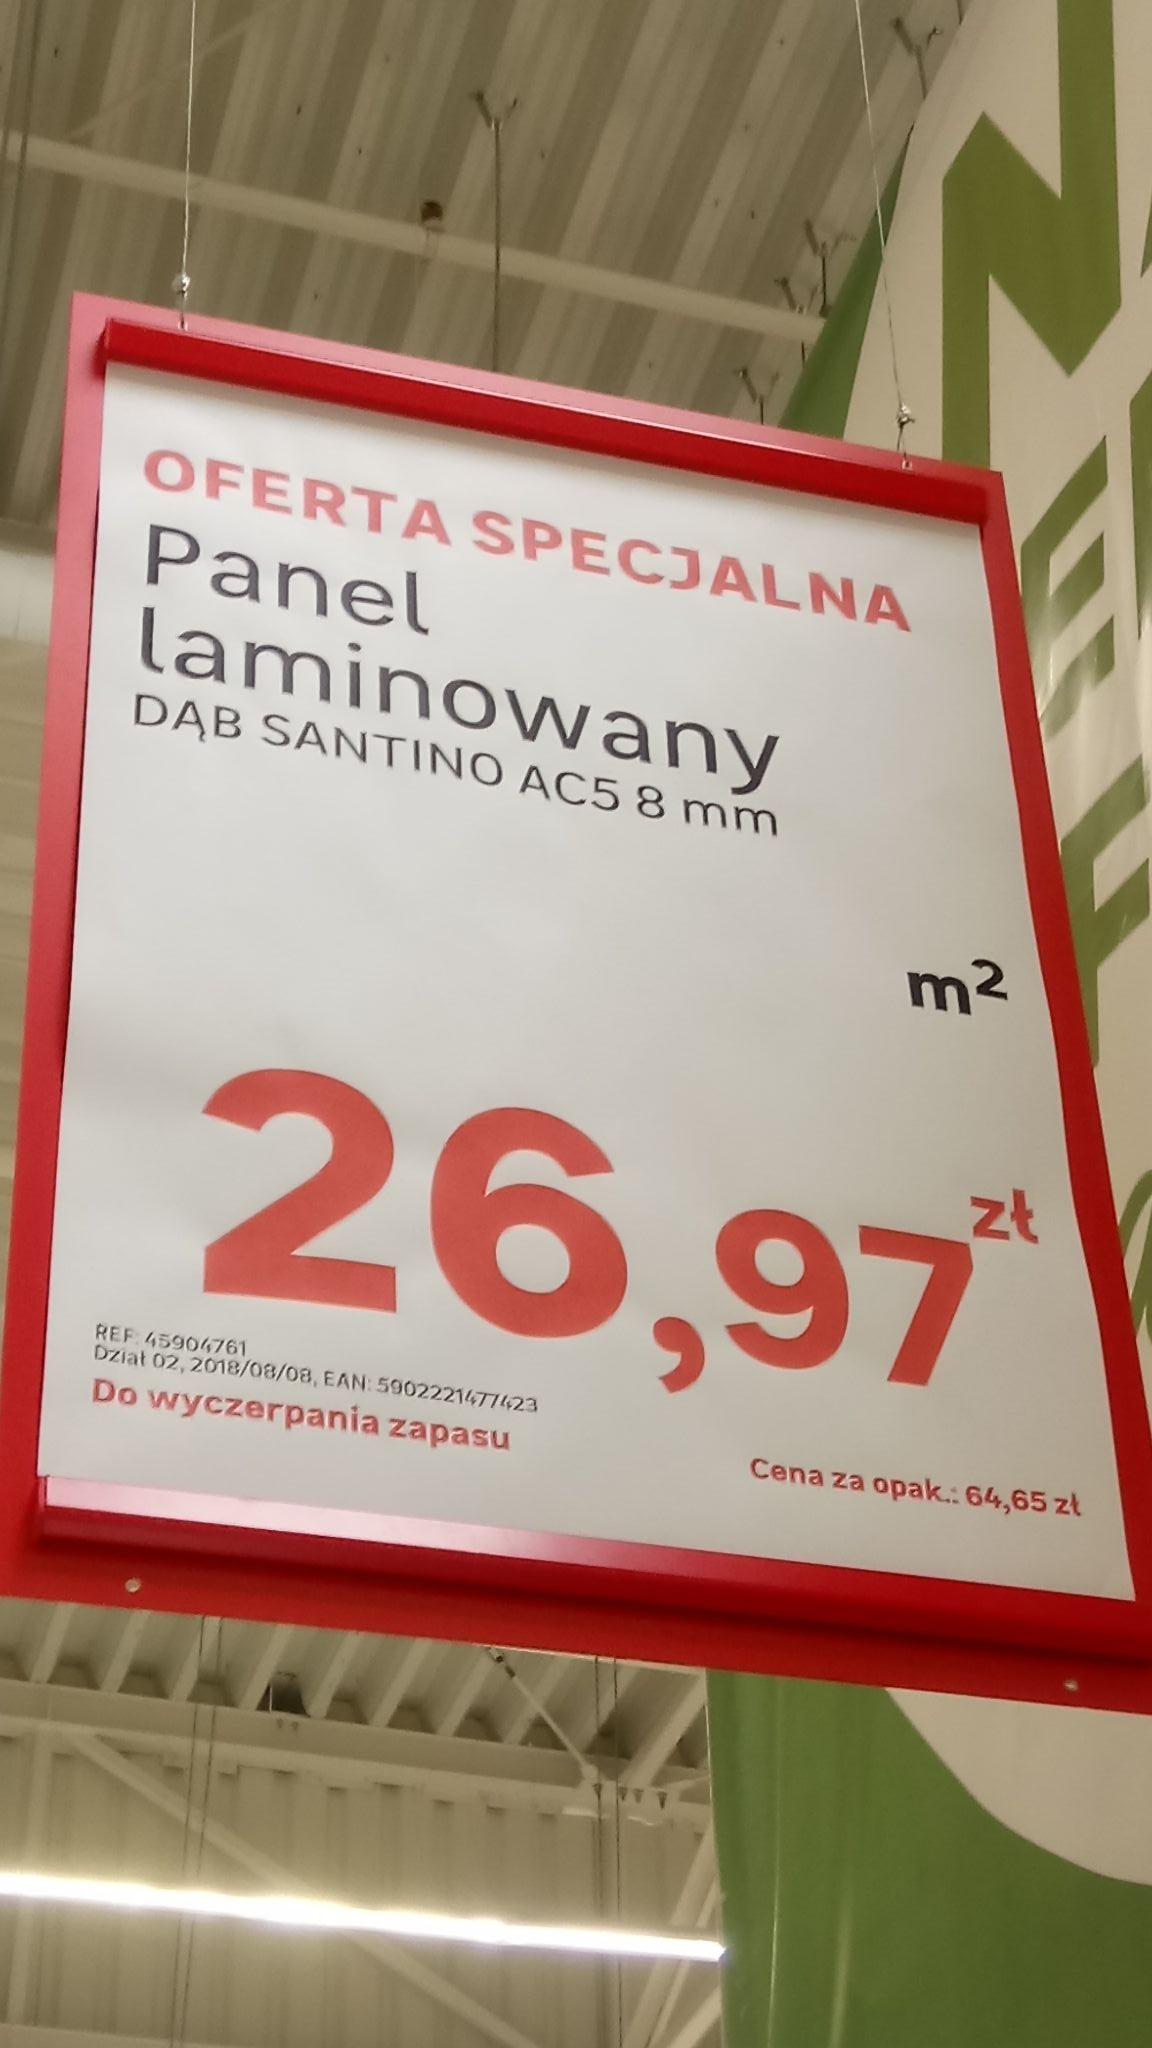 Panel Laminowany Dąb Santino AC5 8mm Leroy-Merlin